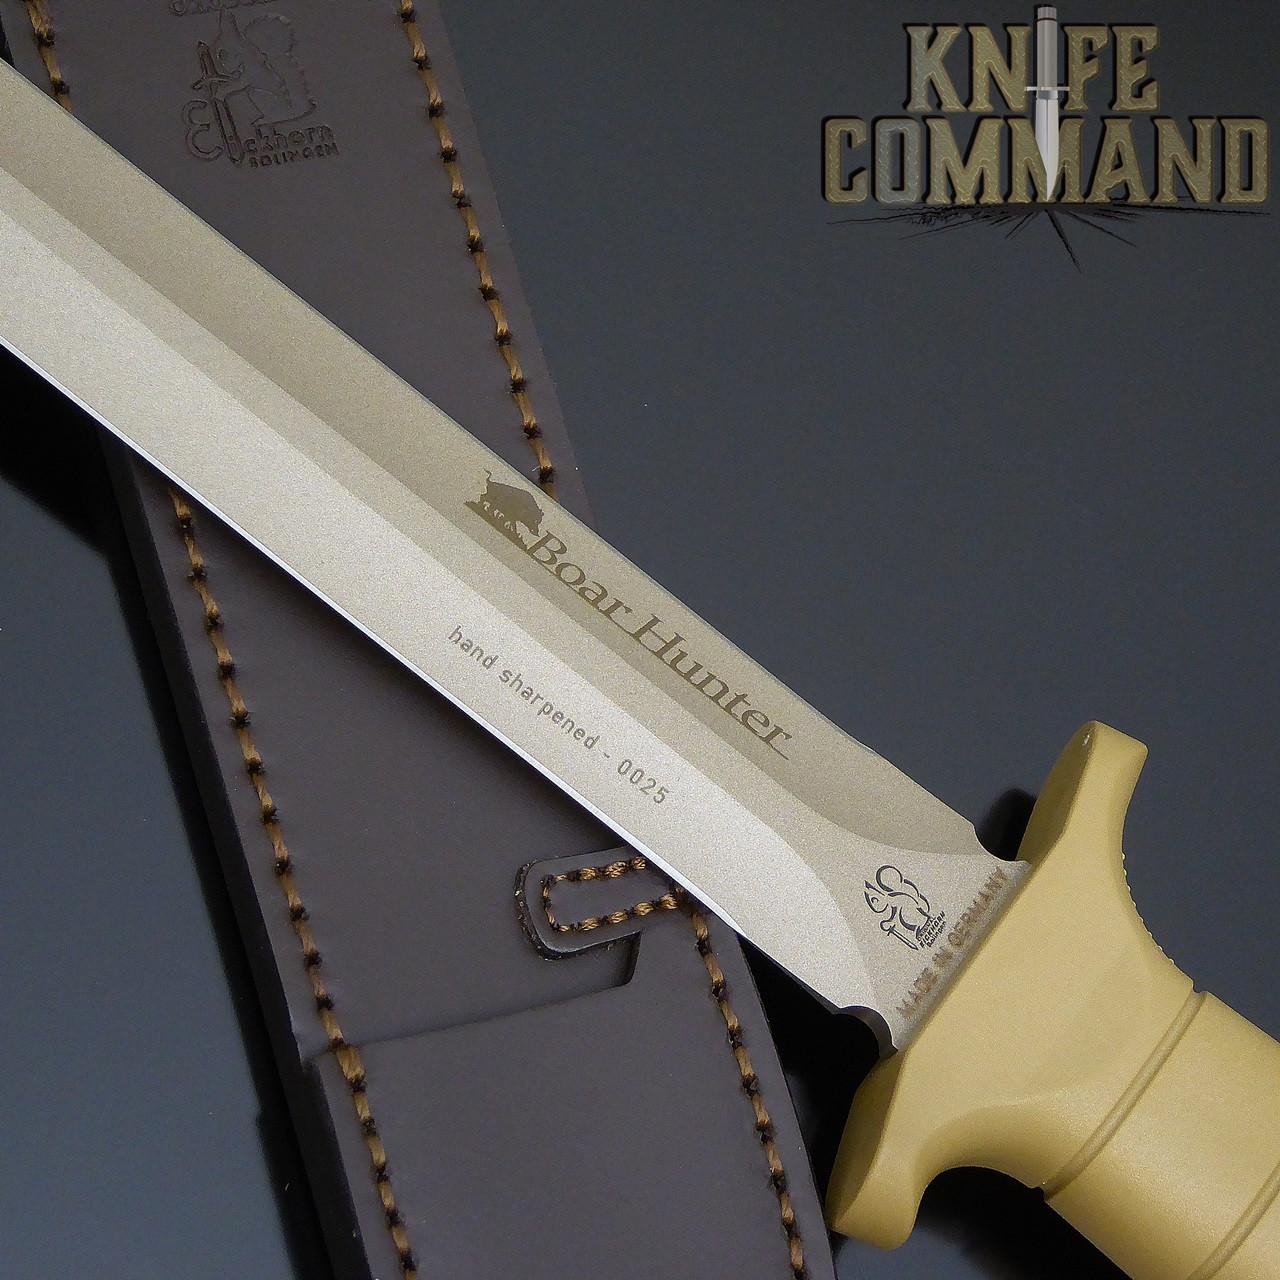 US Tan coated, hand sharpened blade.